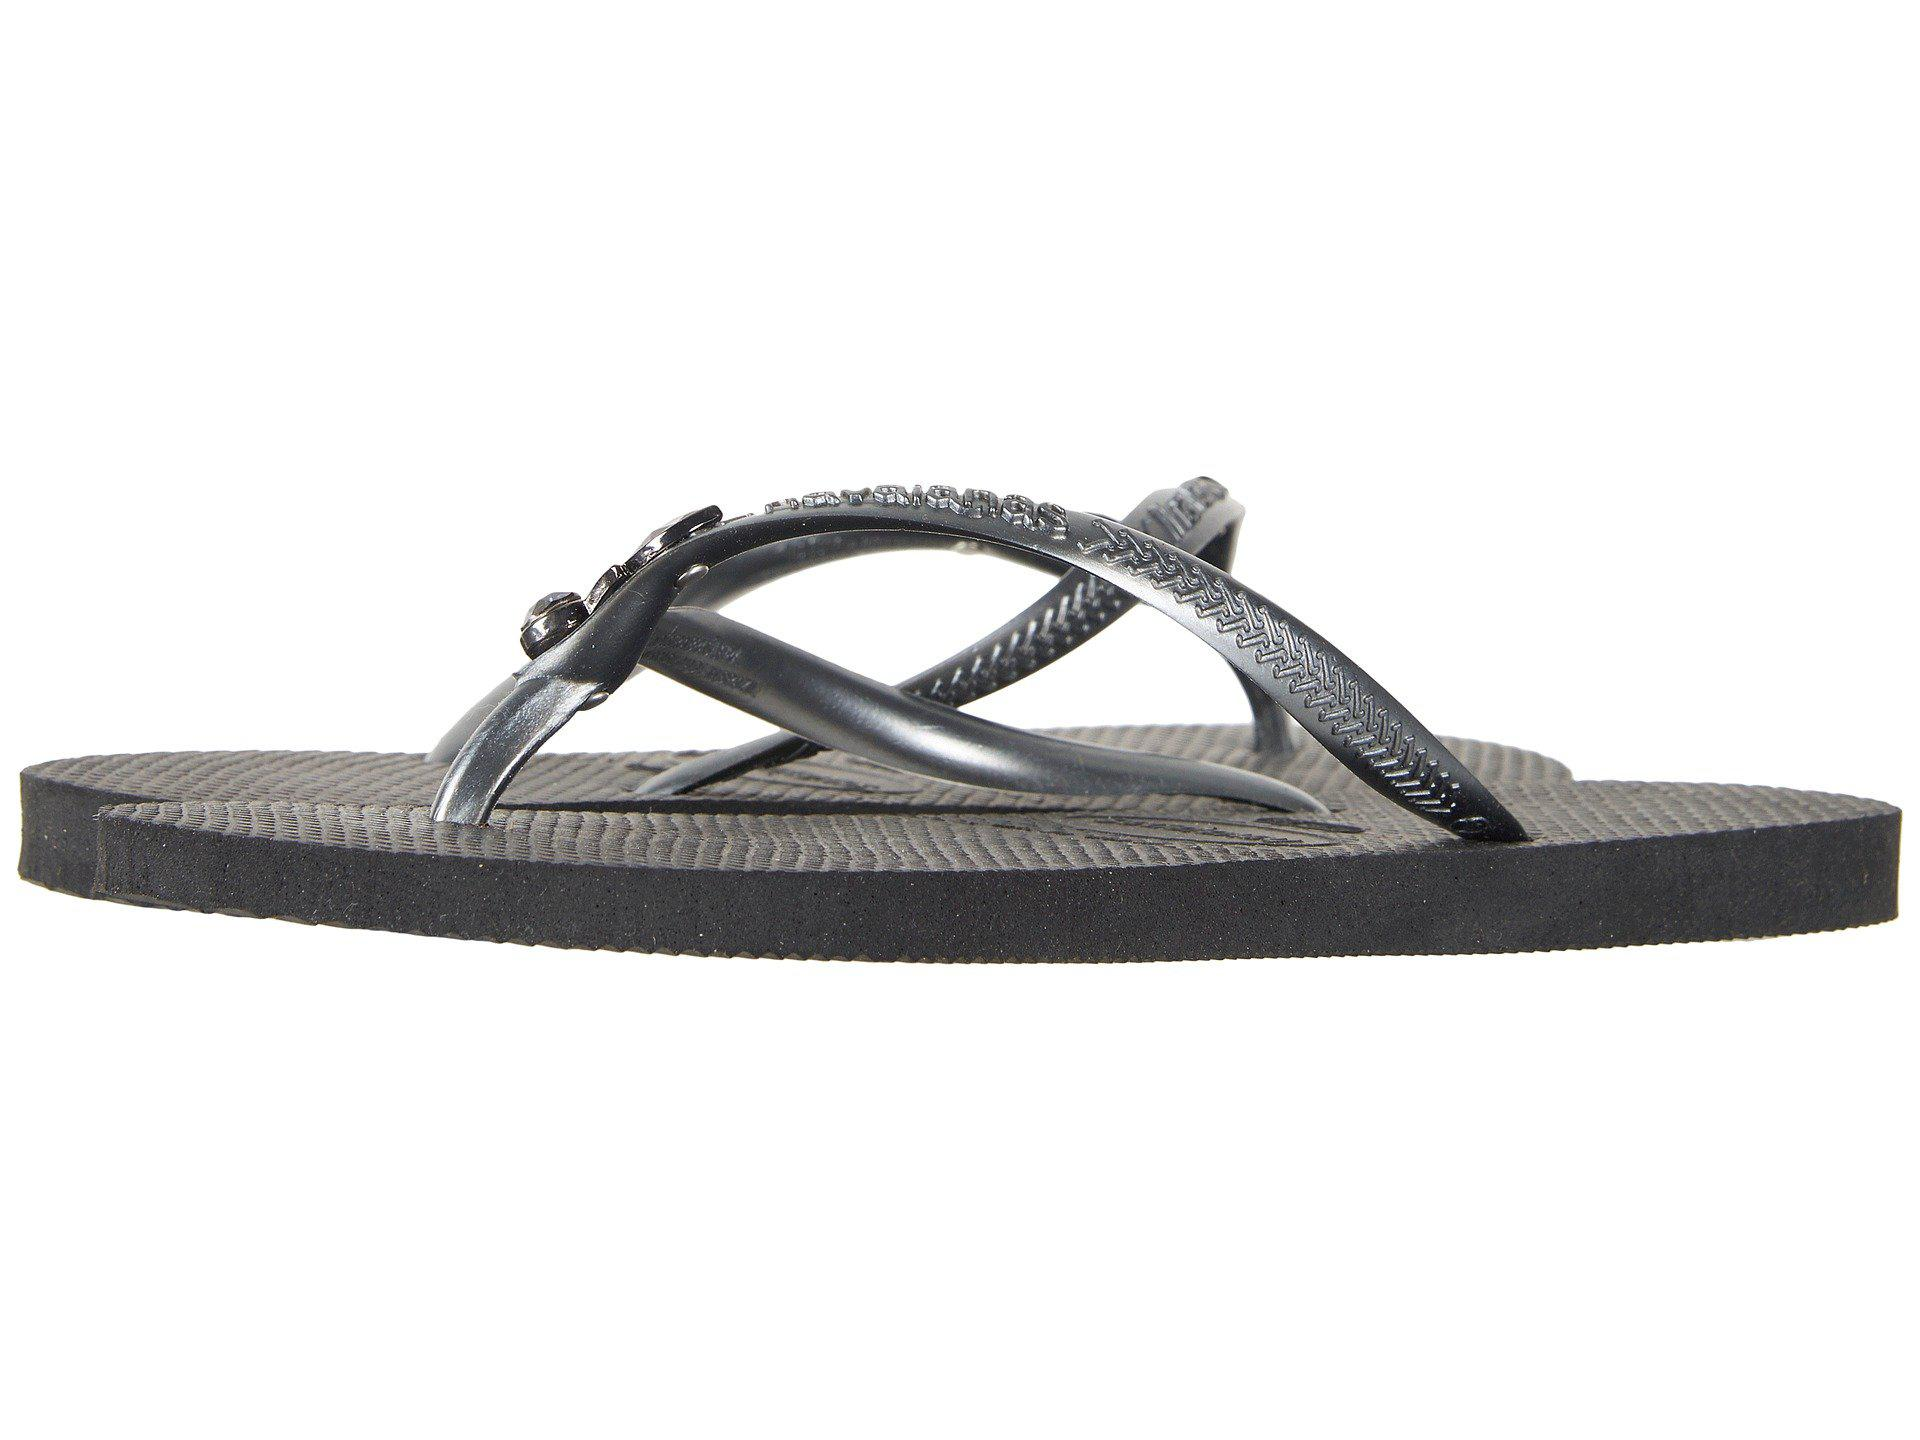 098bfbb5b Lyst - Havaianas Slim Lux Sw Flip Flops in Black